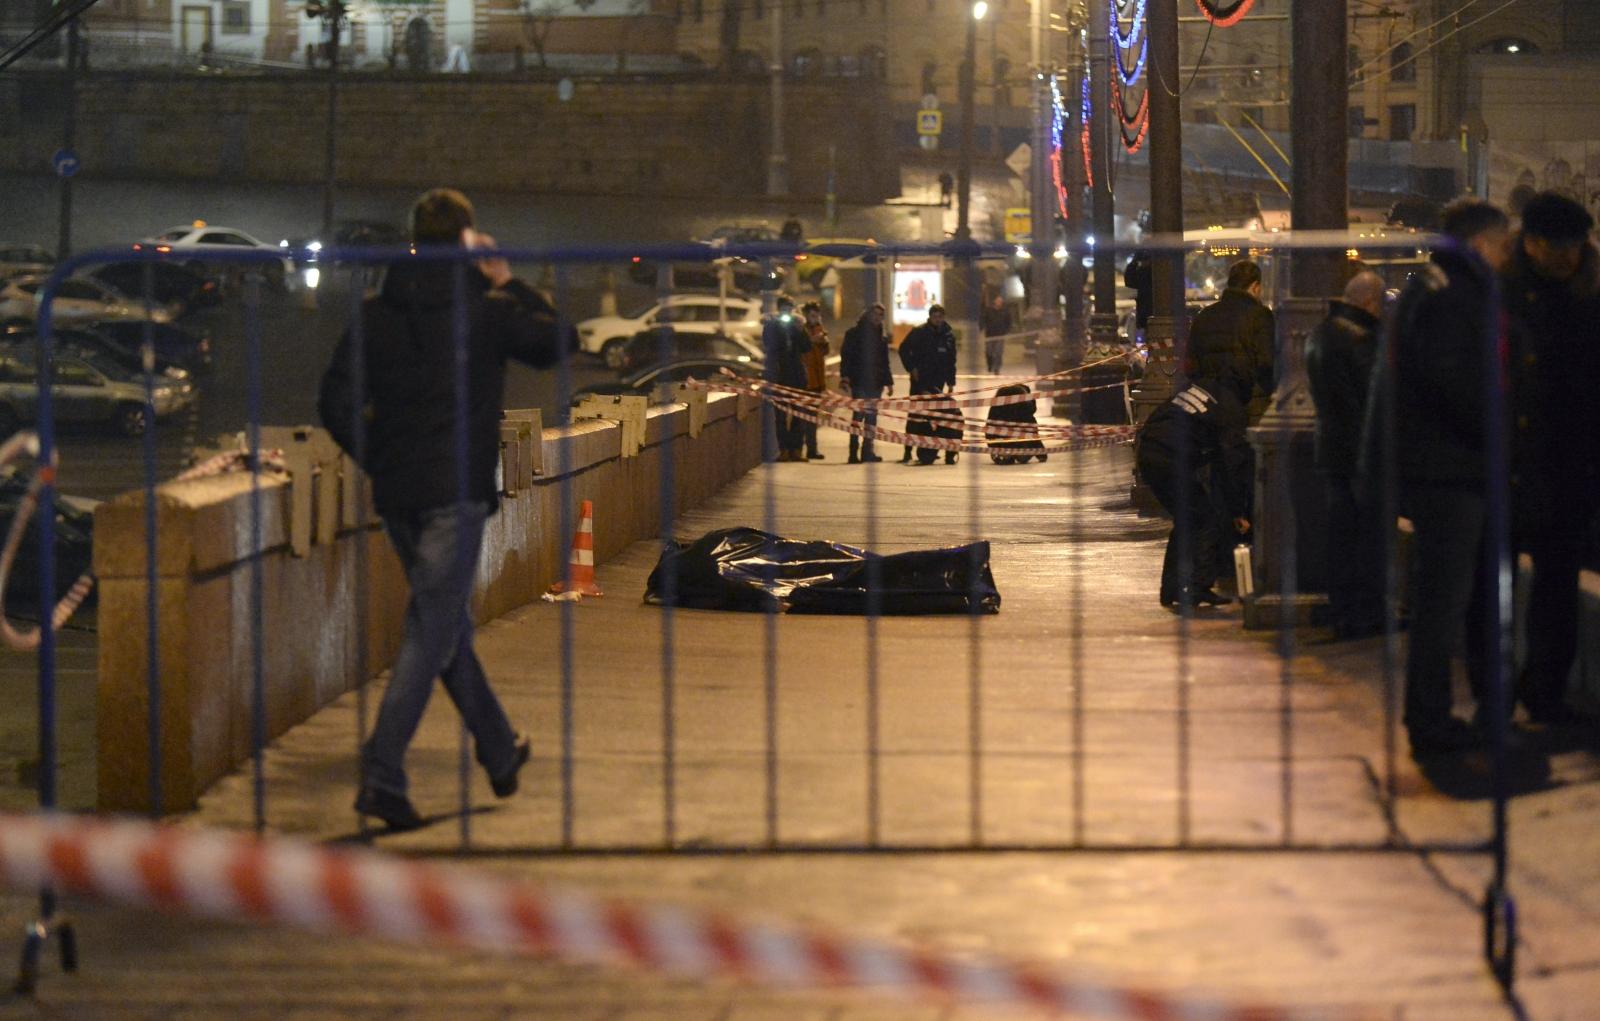 Putin critic Boris Nemtsov shot dead